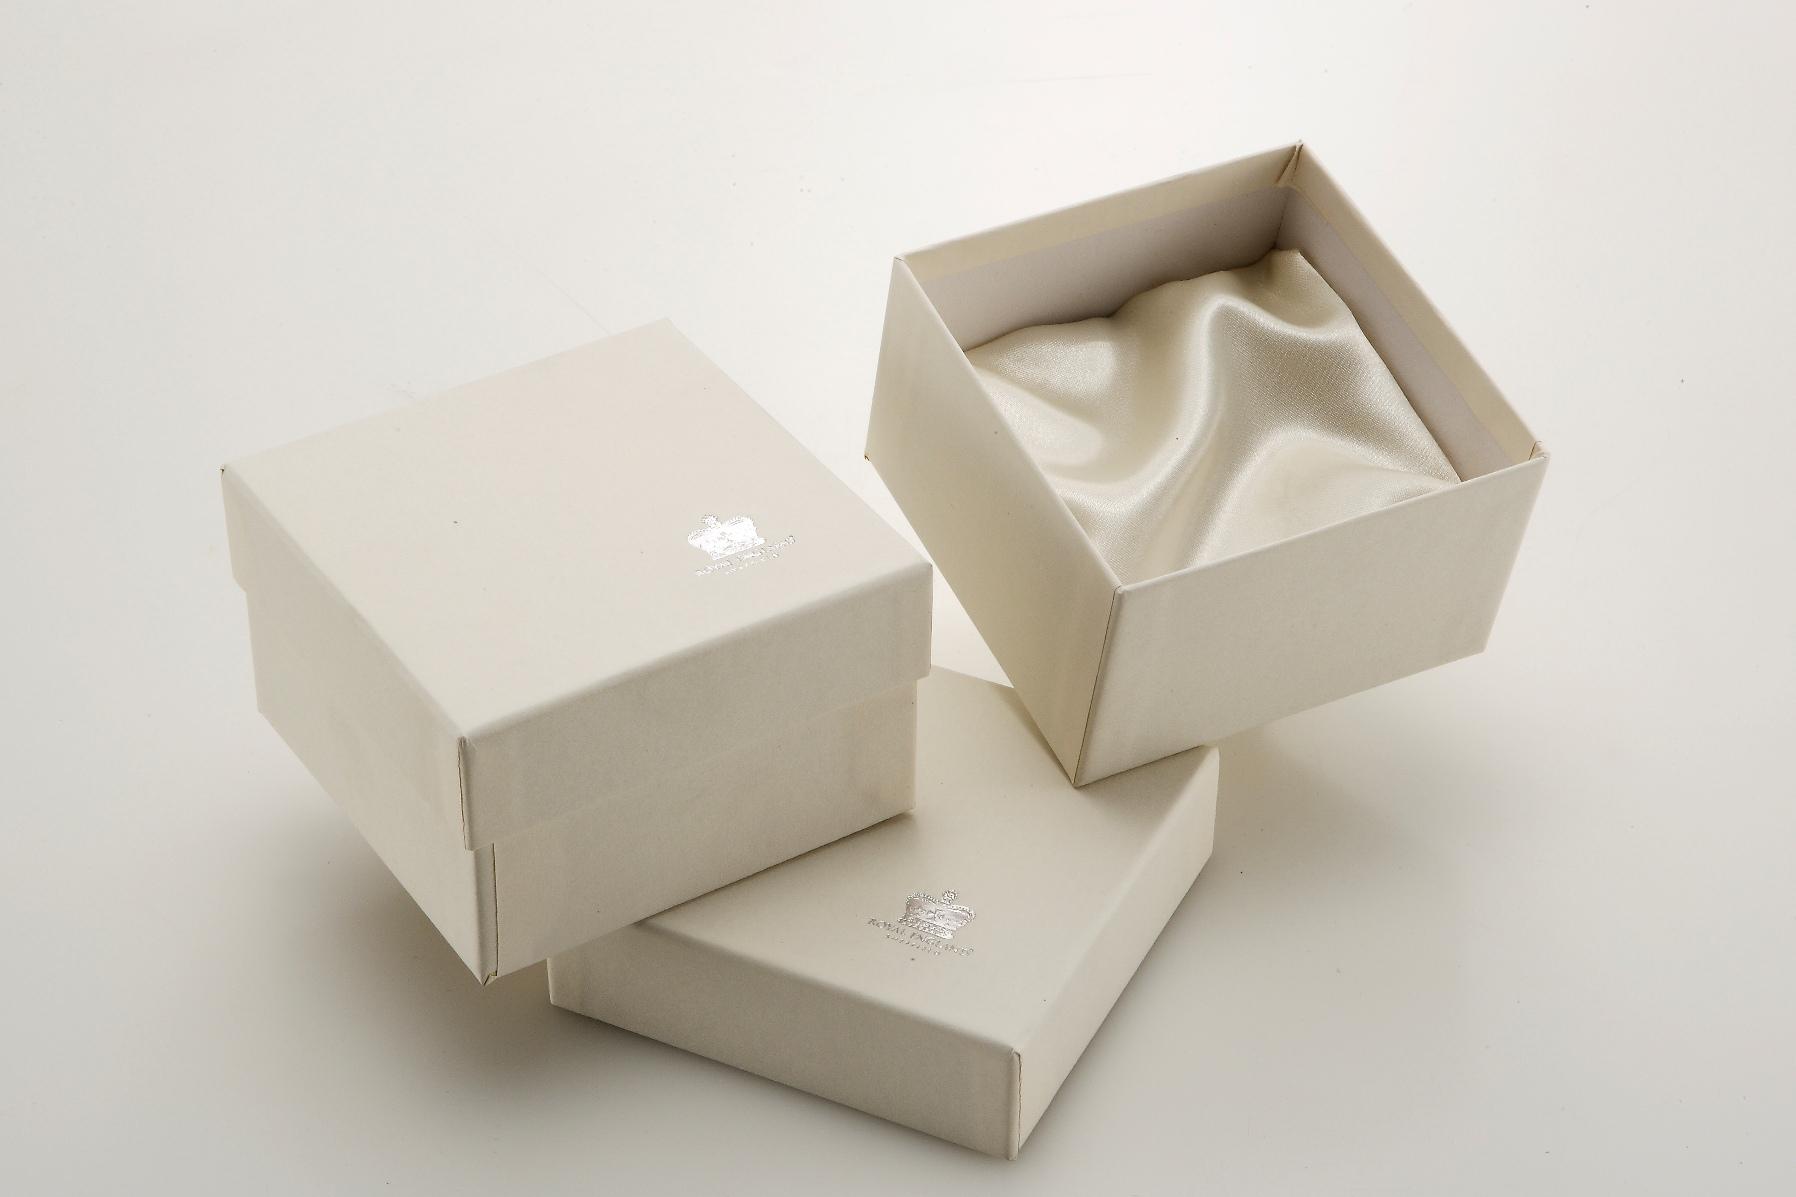 Scatola havana con raso cm.8,8x8,8x10,3h